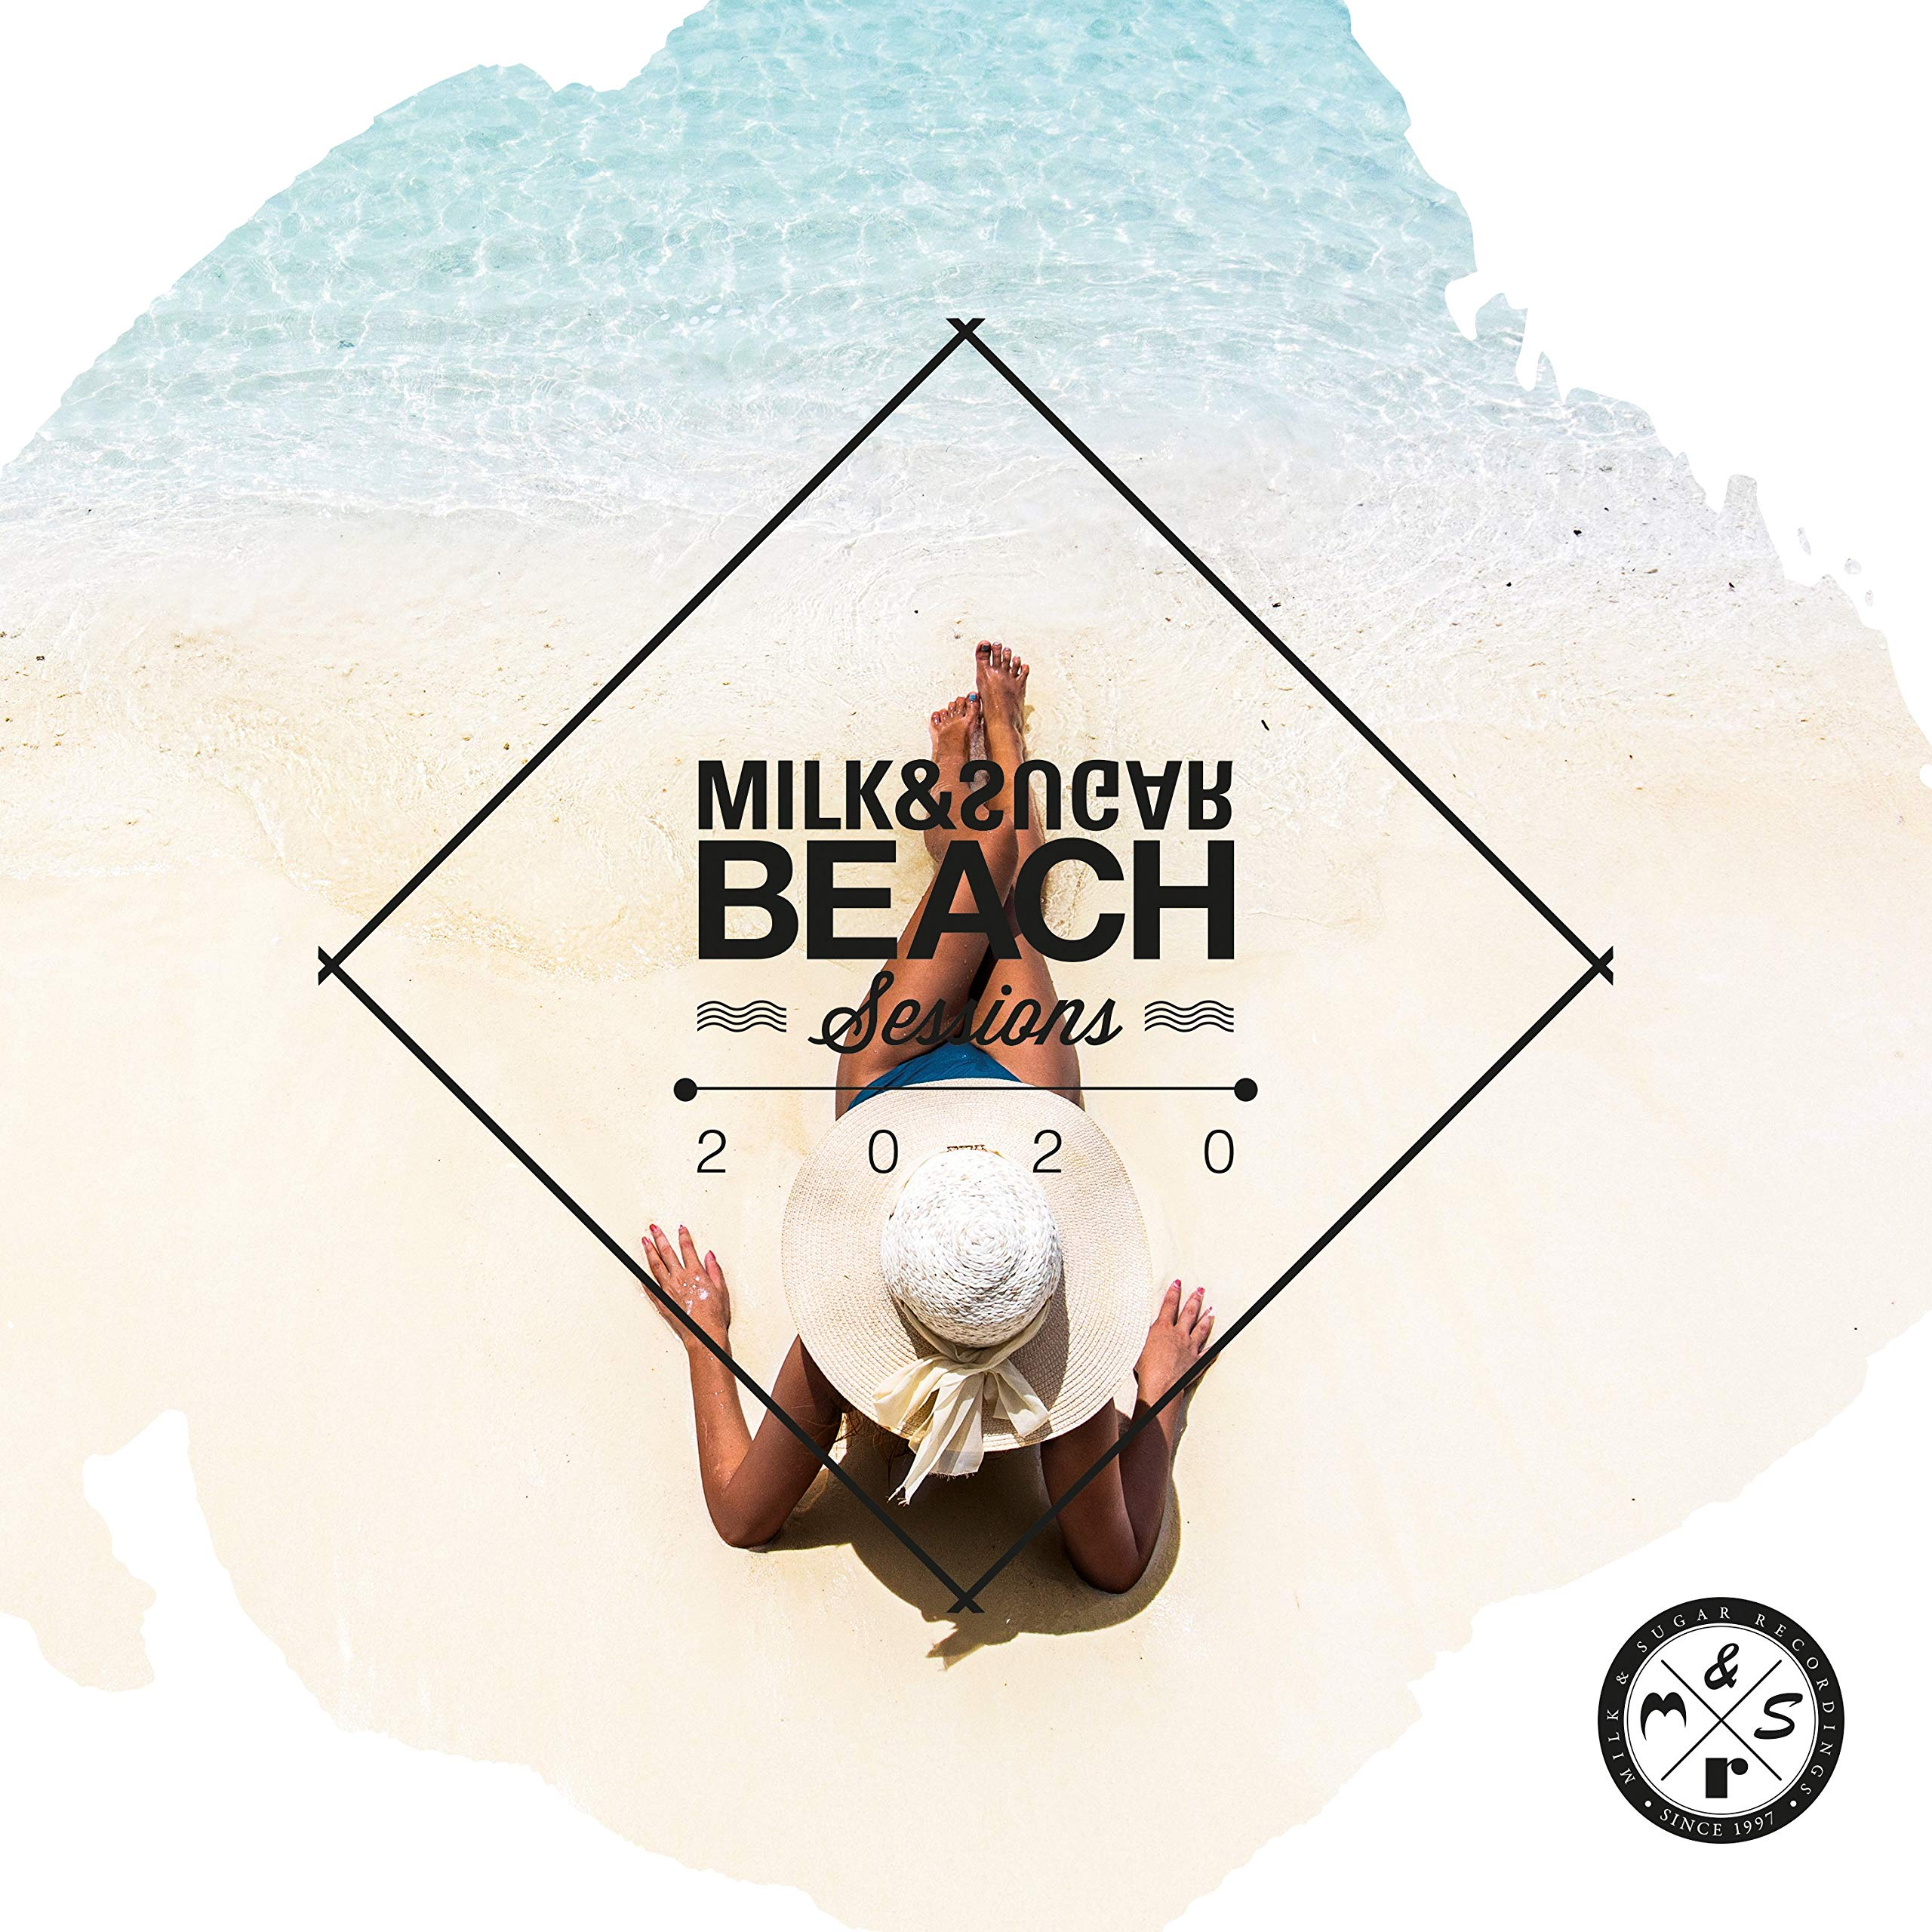 VA - Milk & Sugar Beach Sessions 2020 (2020) [FLAC] Download